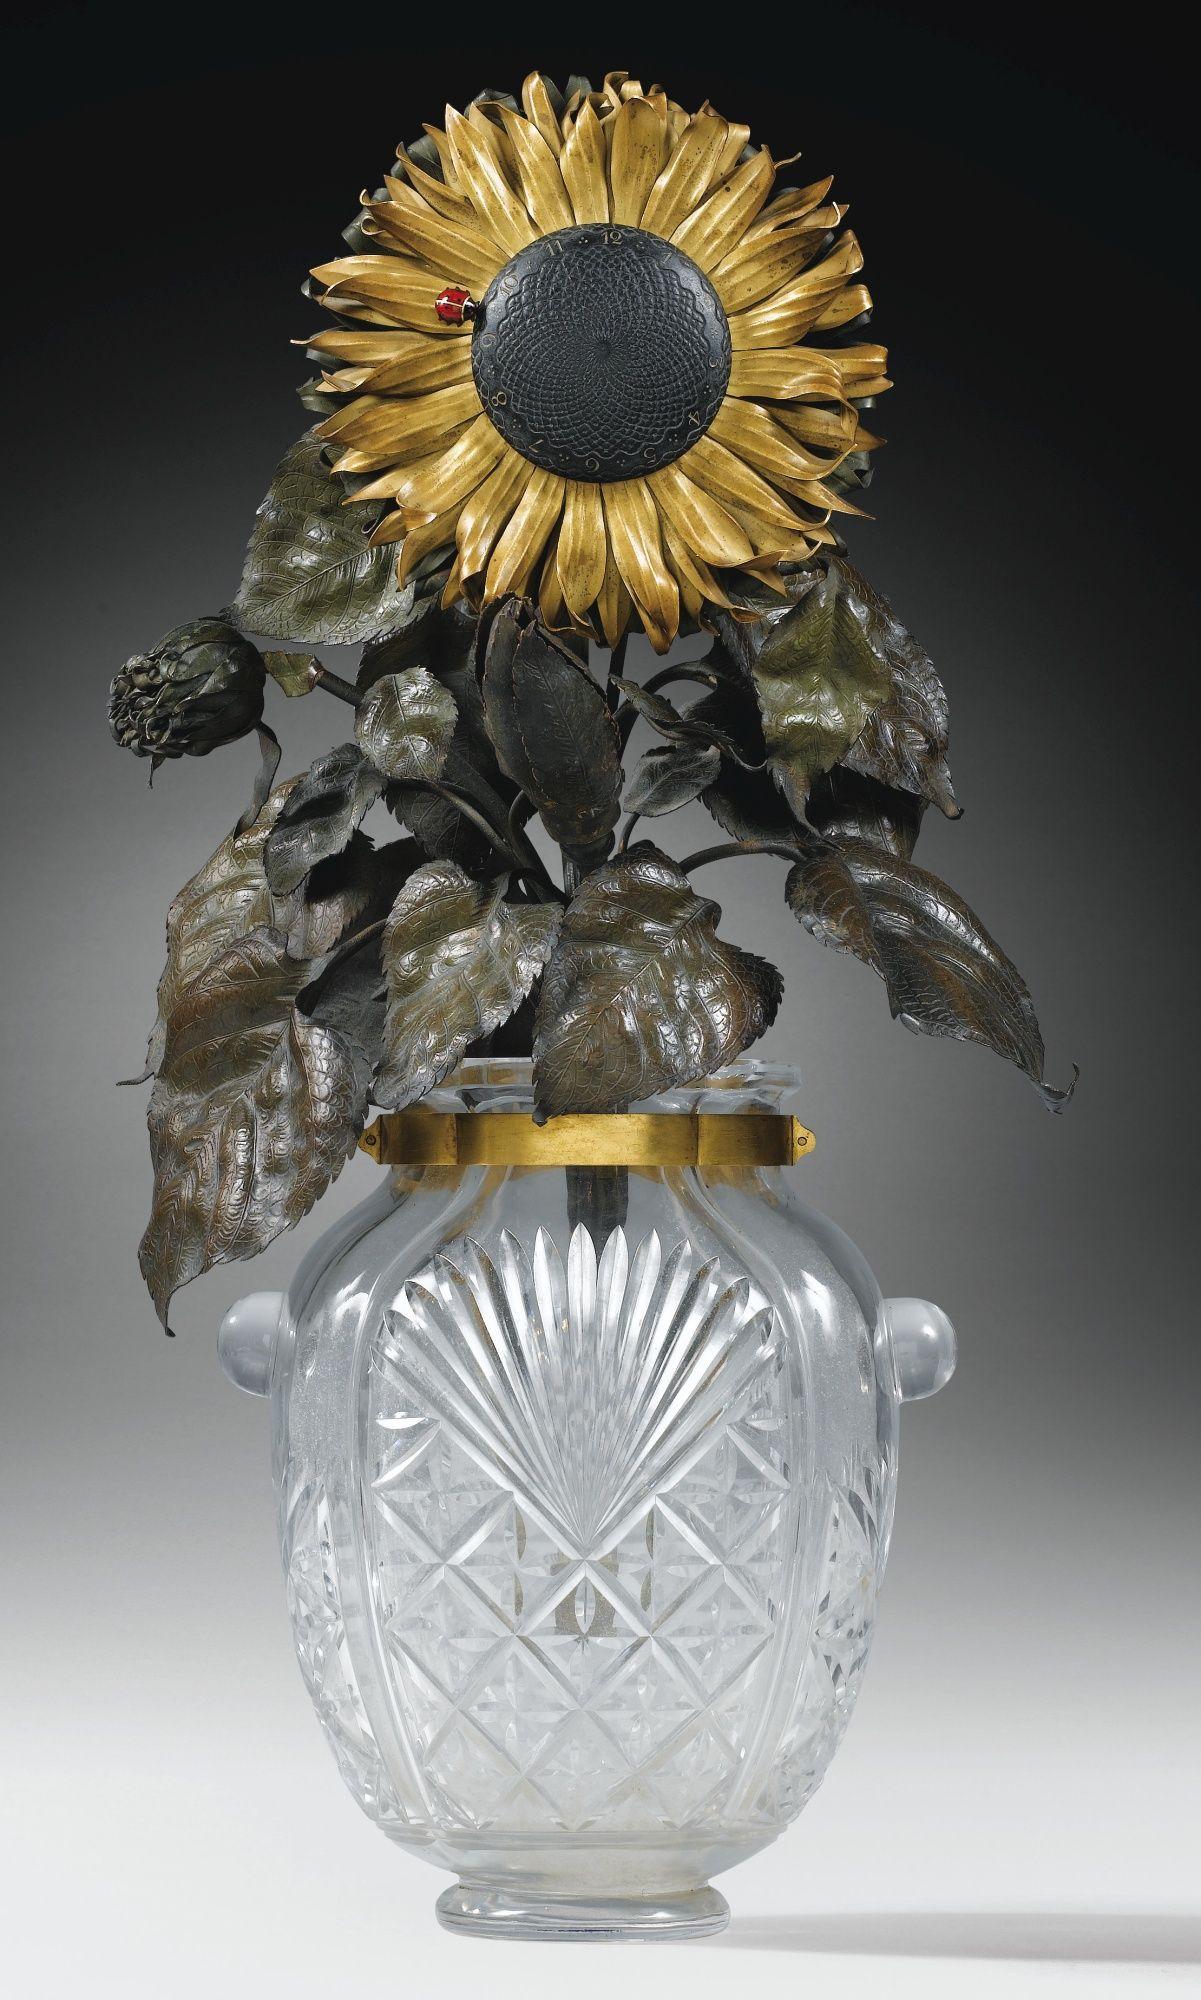 Dating baccarat crystal